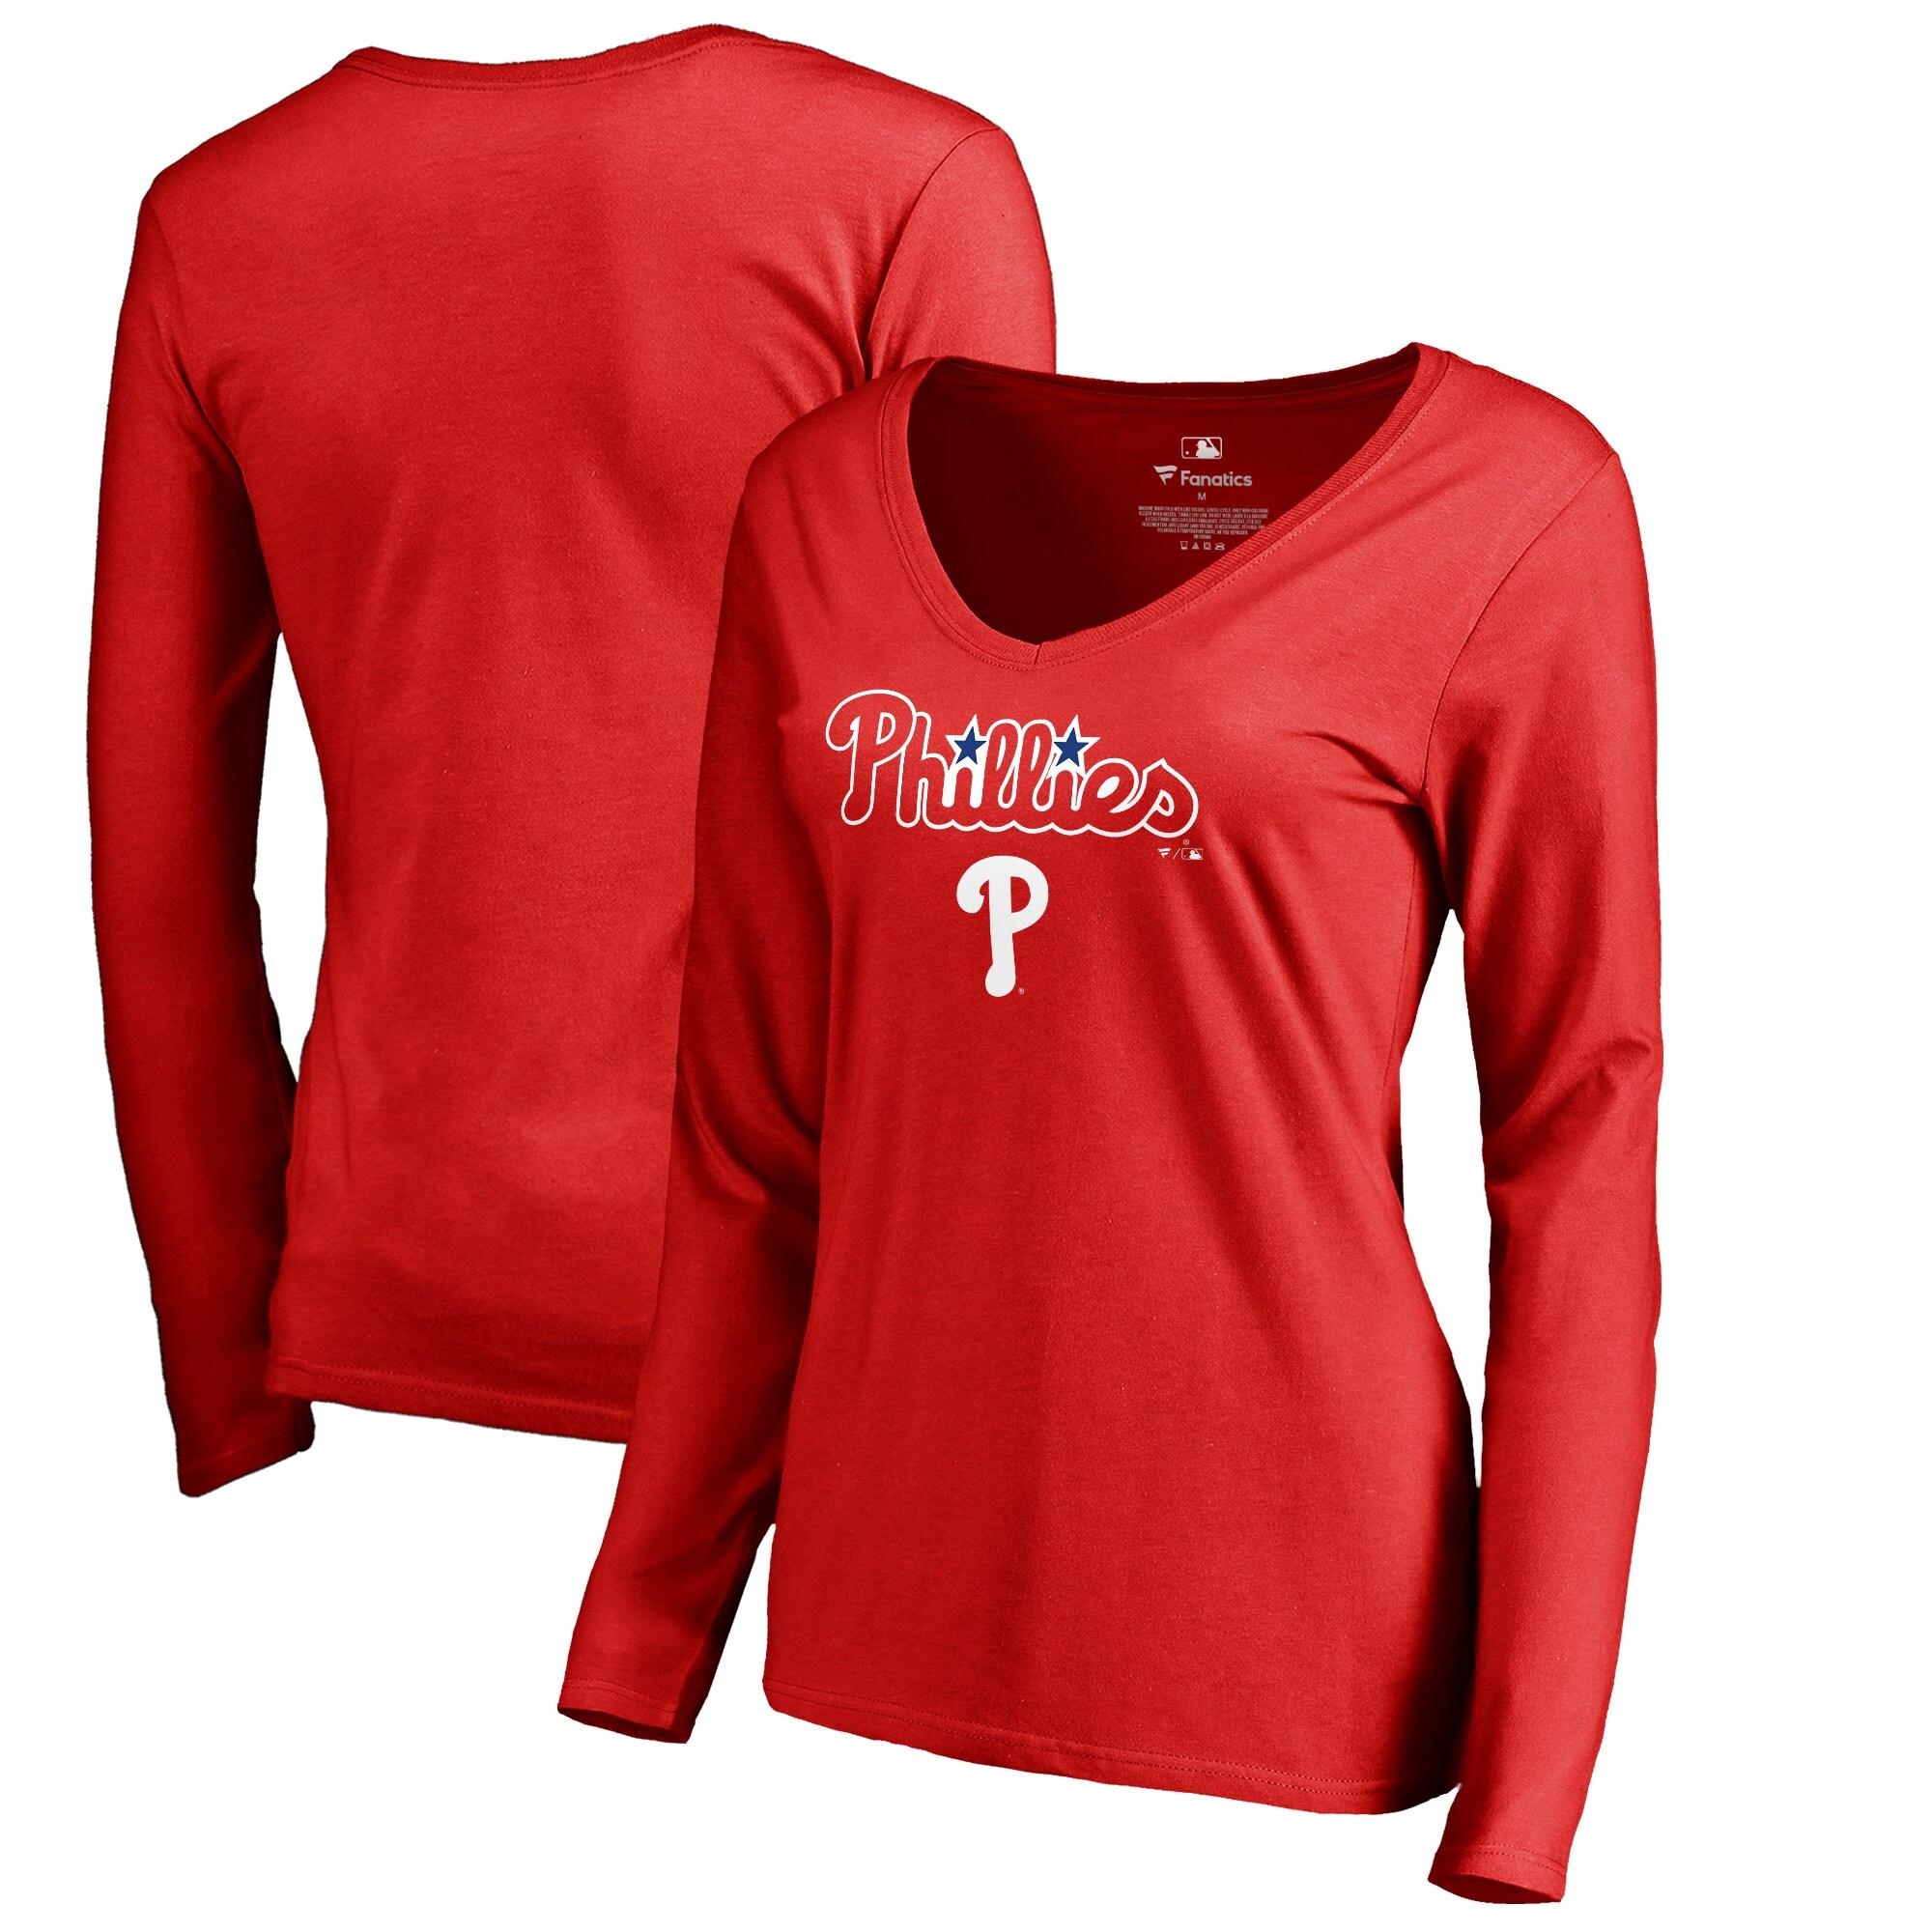 Philadelphia Phillies Fanatics Branded Women's Team Lockup Slim Fit Long Sleeve V-Neck T-Shirt - Red